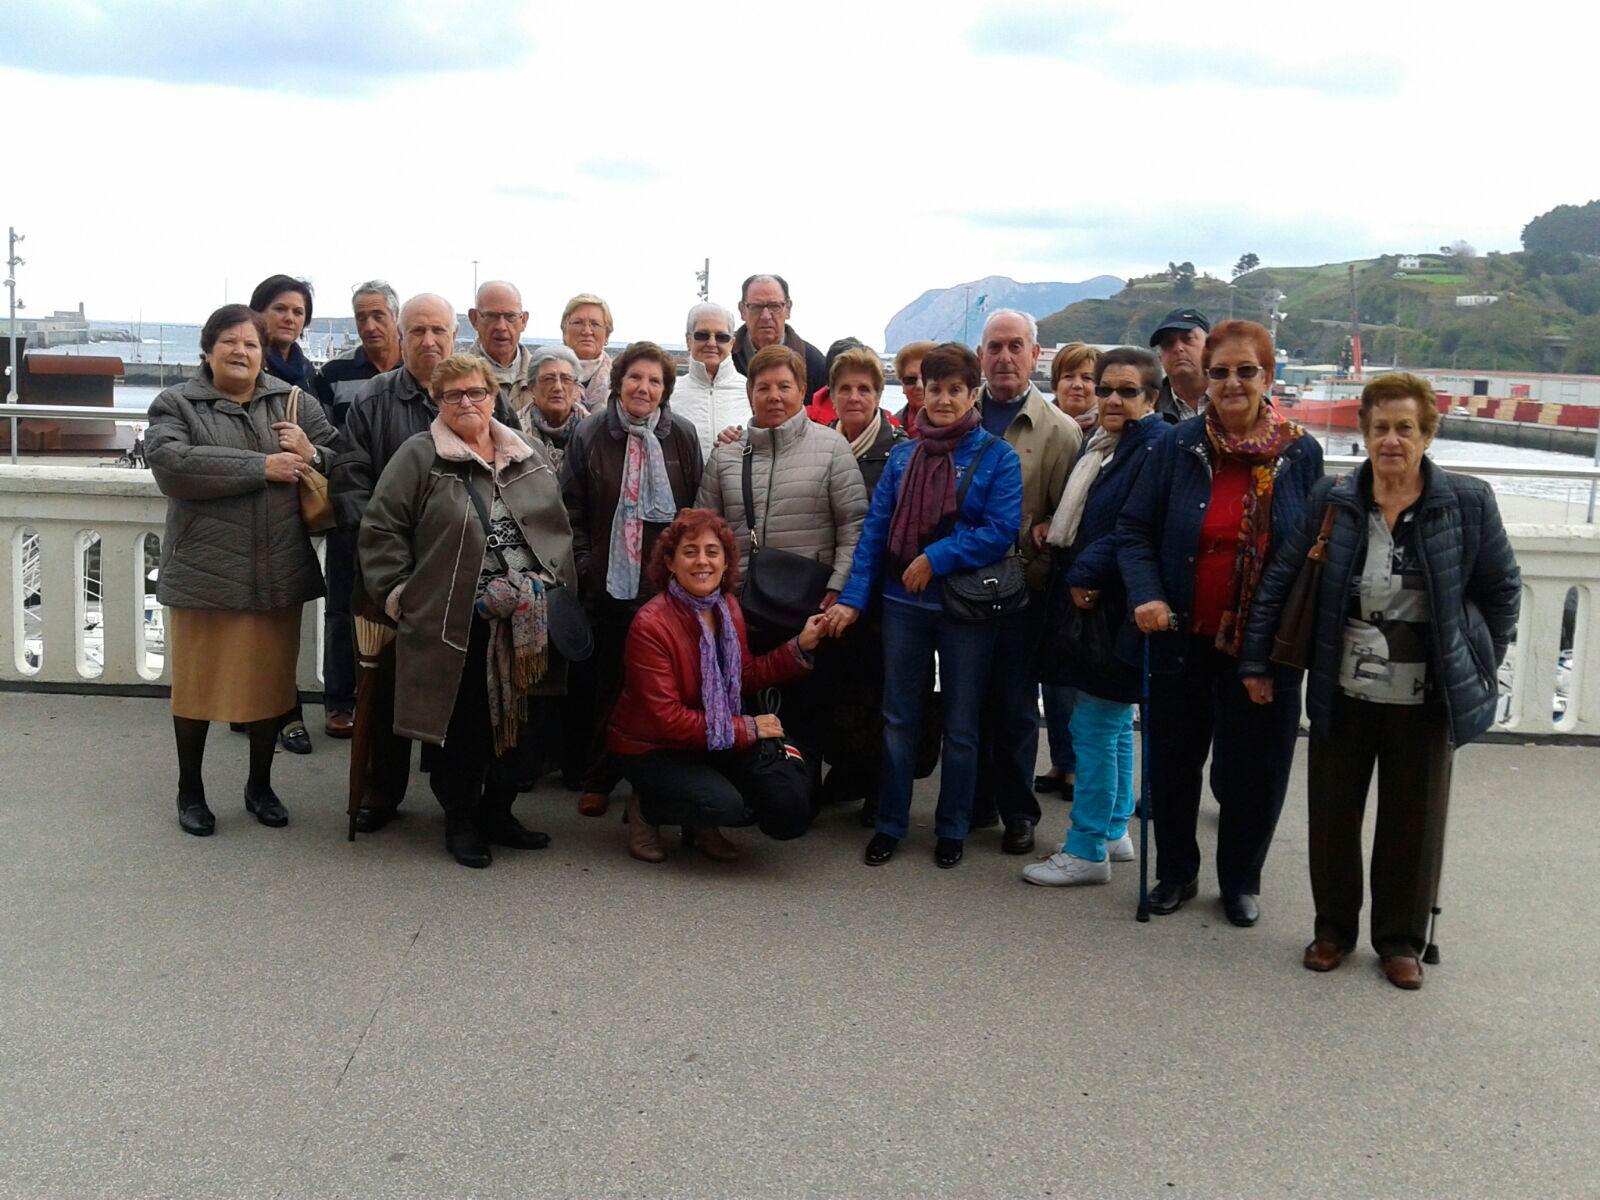 Salida de los usuarios/as del Hogar de San Juan en Santurtzi al municipio vizcaíno de Bermeo